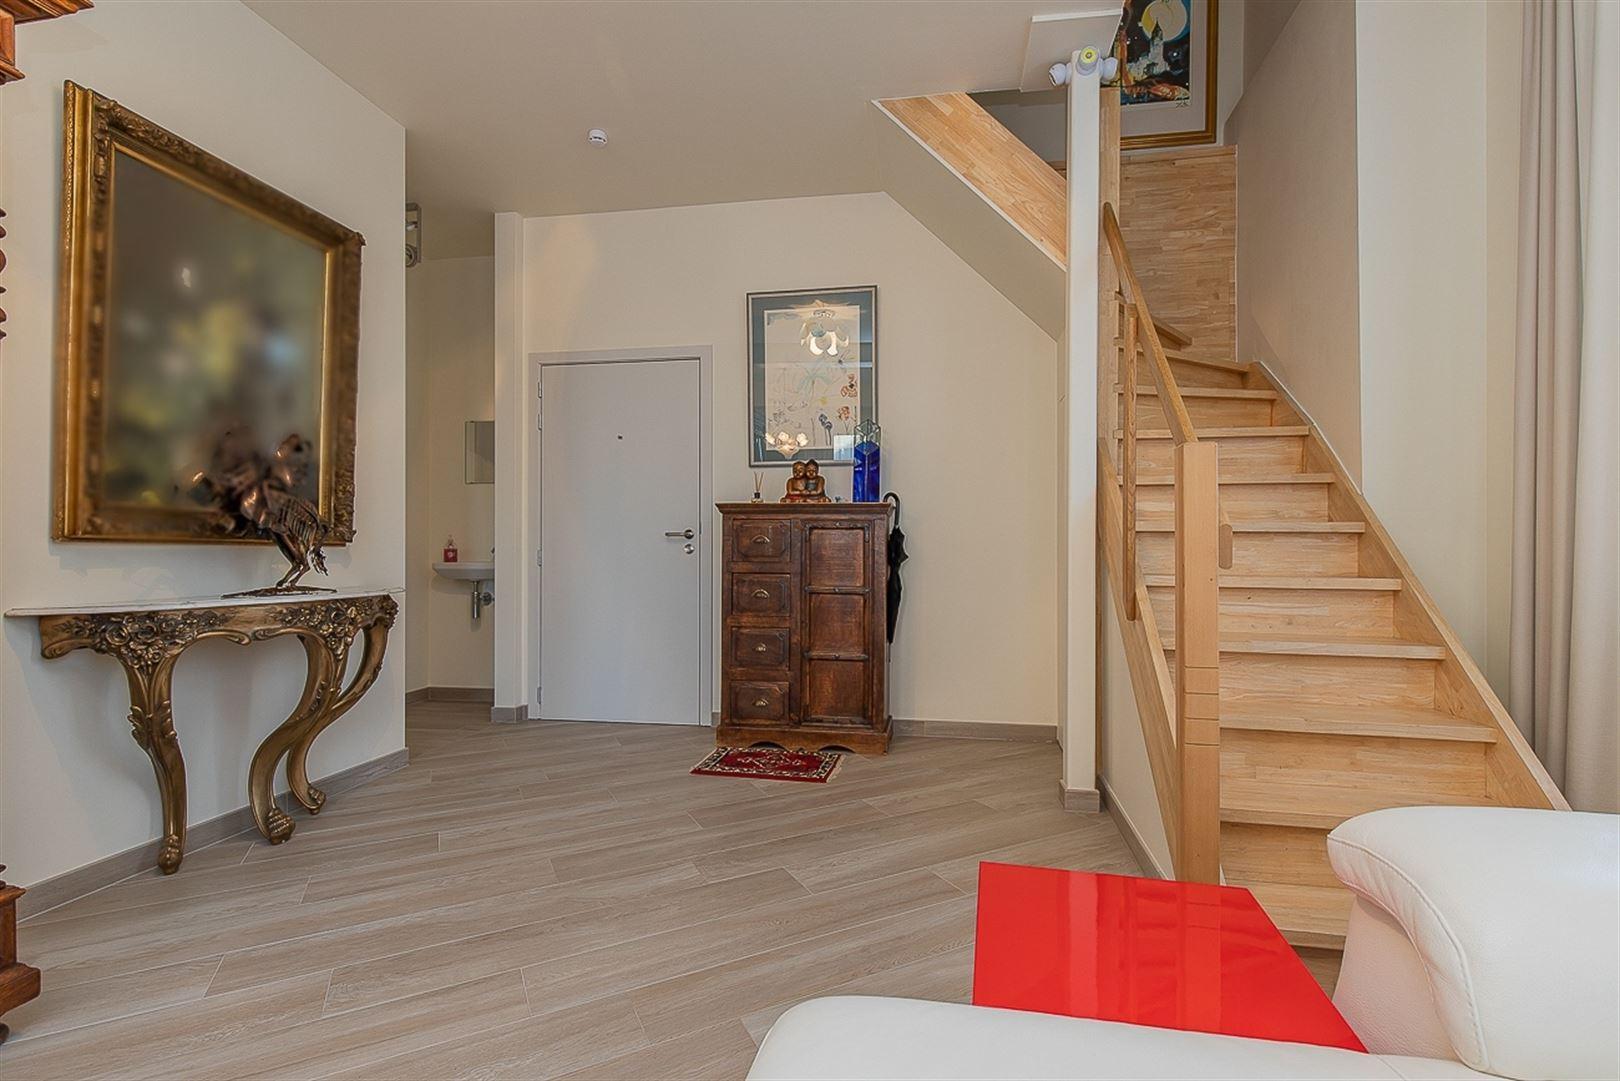 Foto 12 : Duplex/Penthouse te 9200 DENDERMONDE (België) - Prijs € 399.000